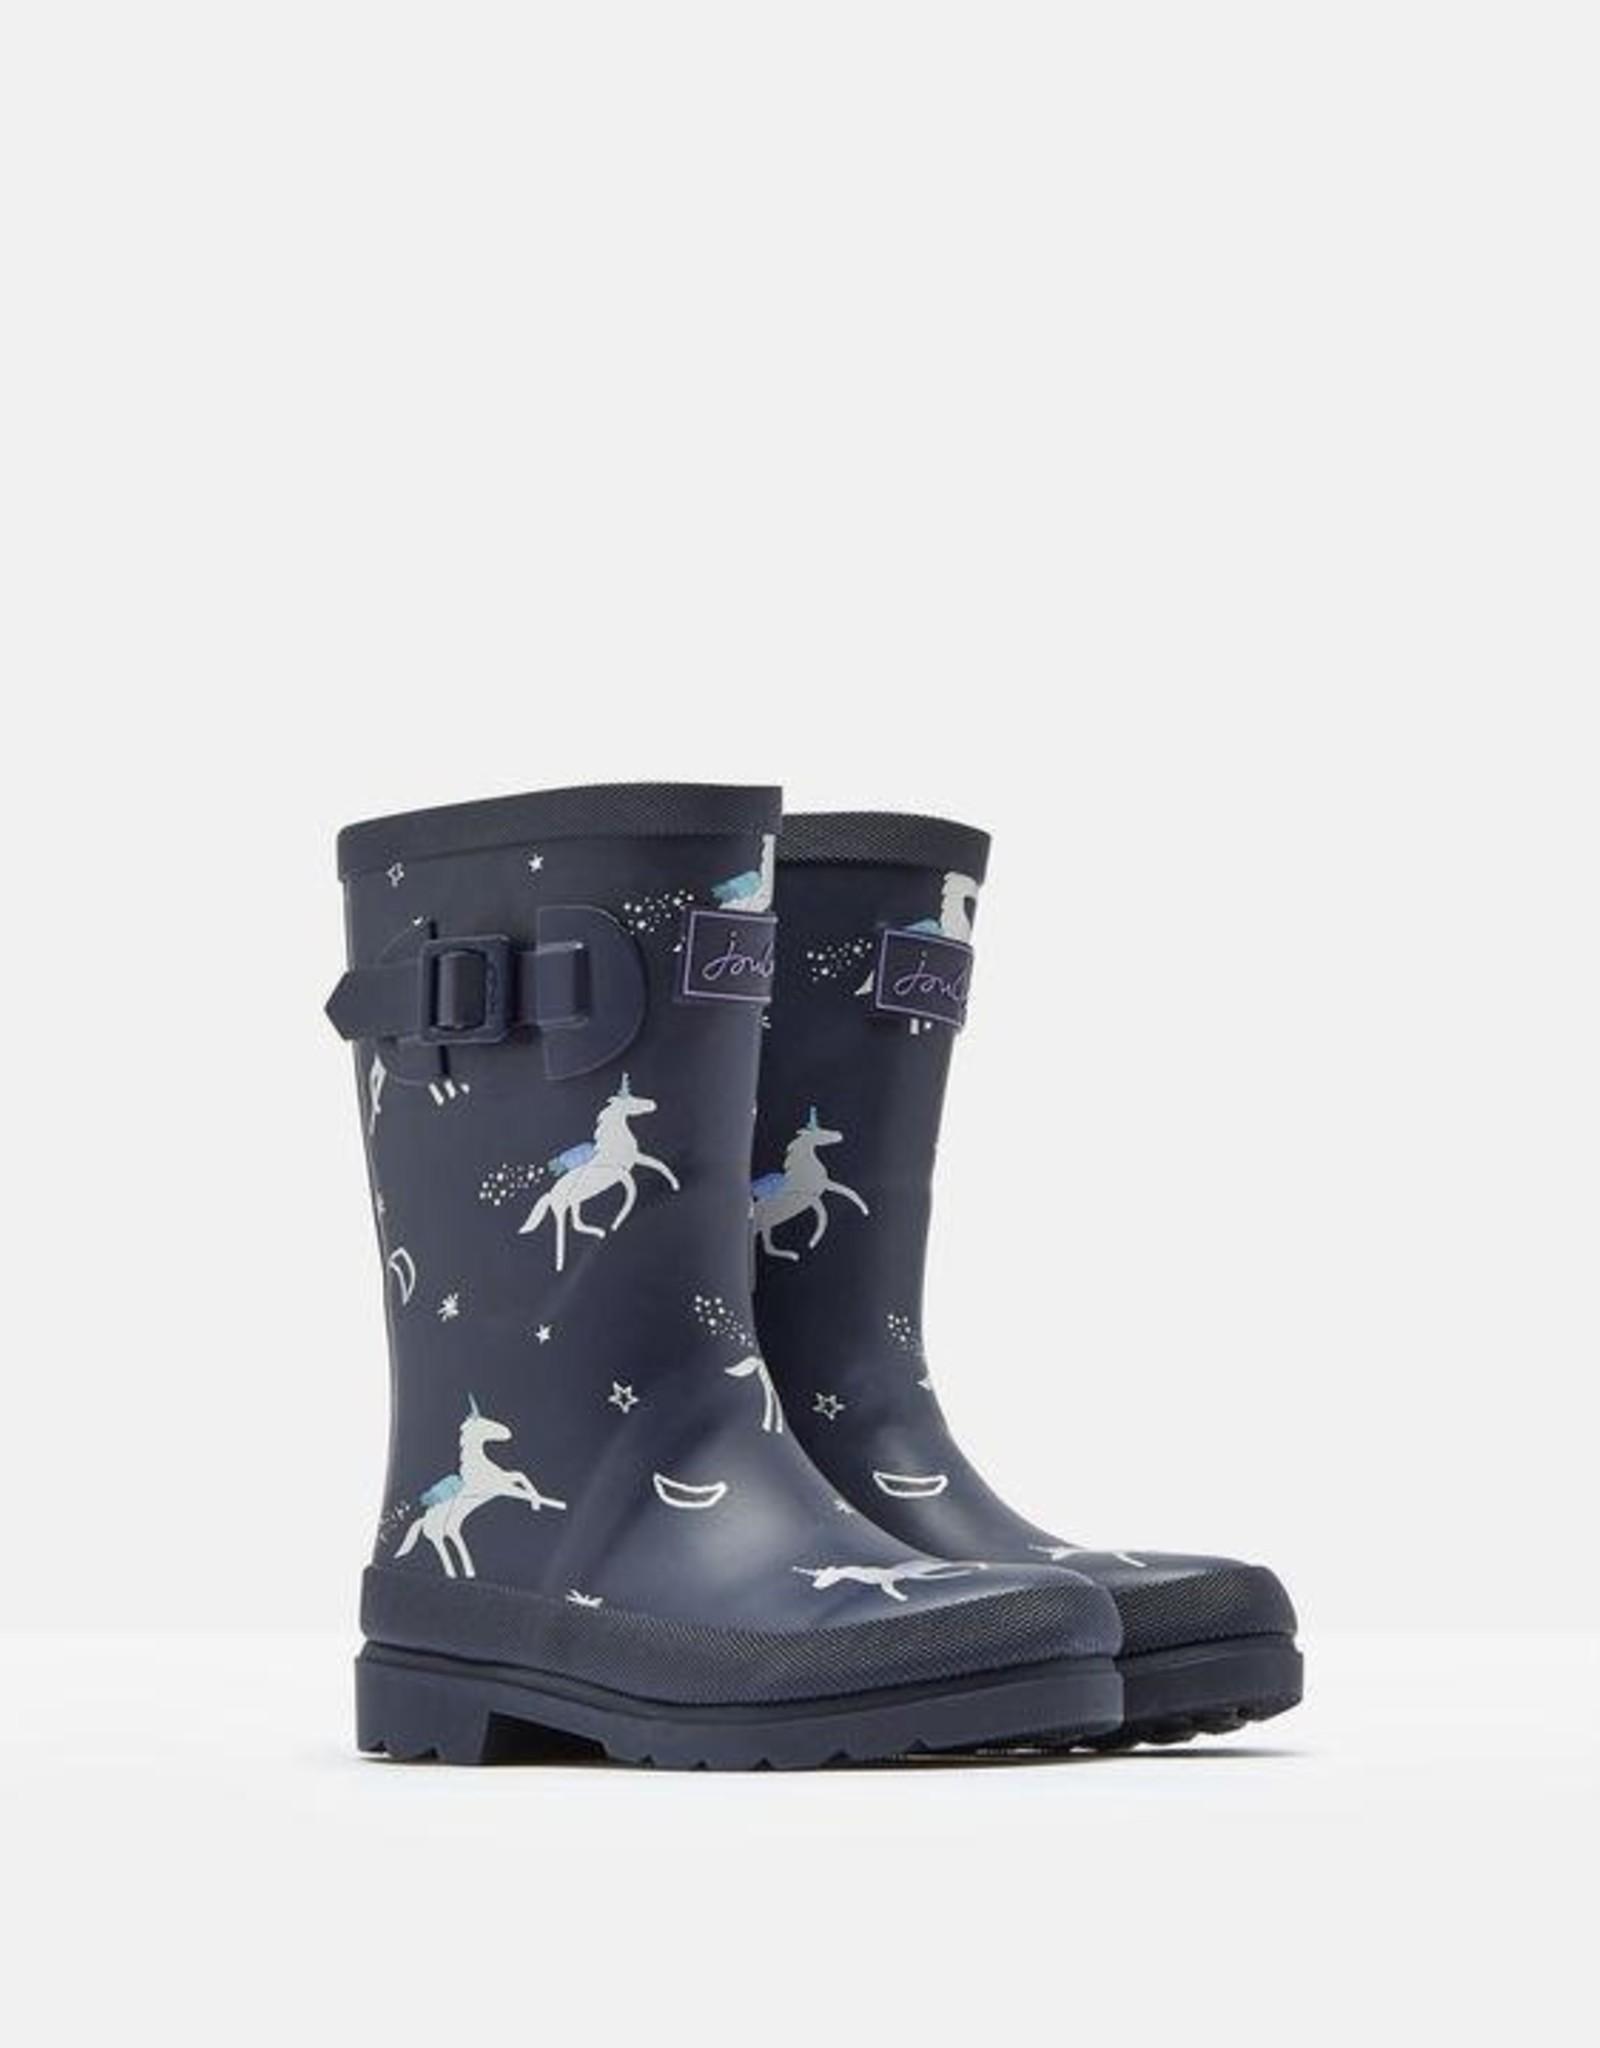 Joules Kids' Welly Print  Rain Boot